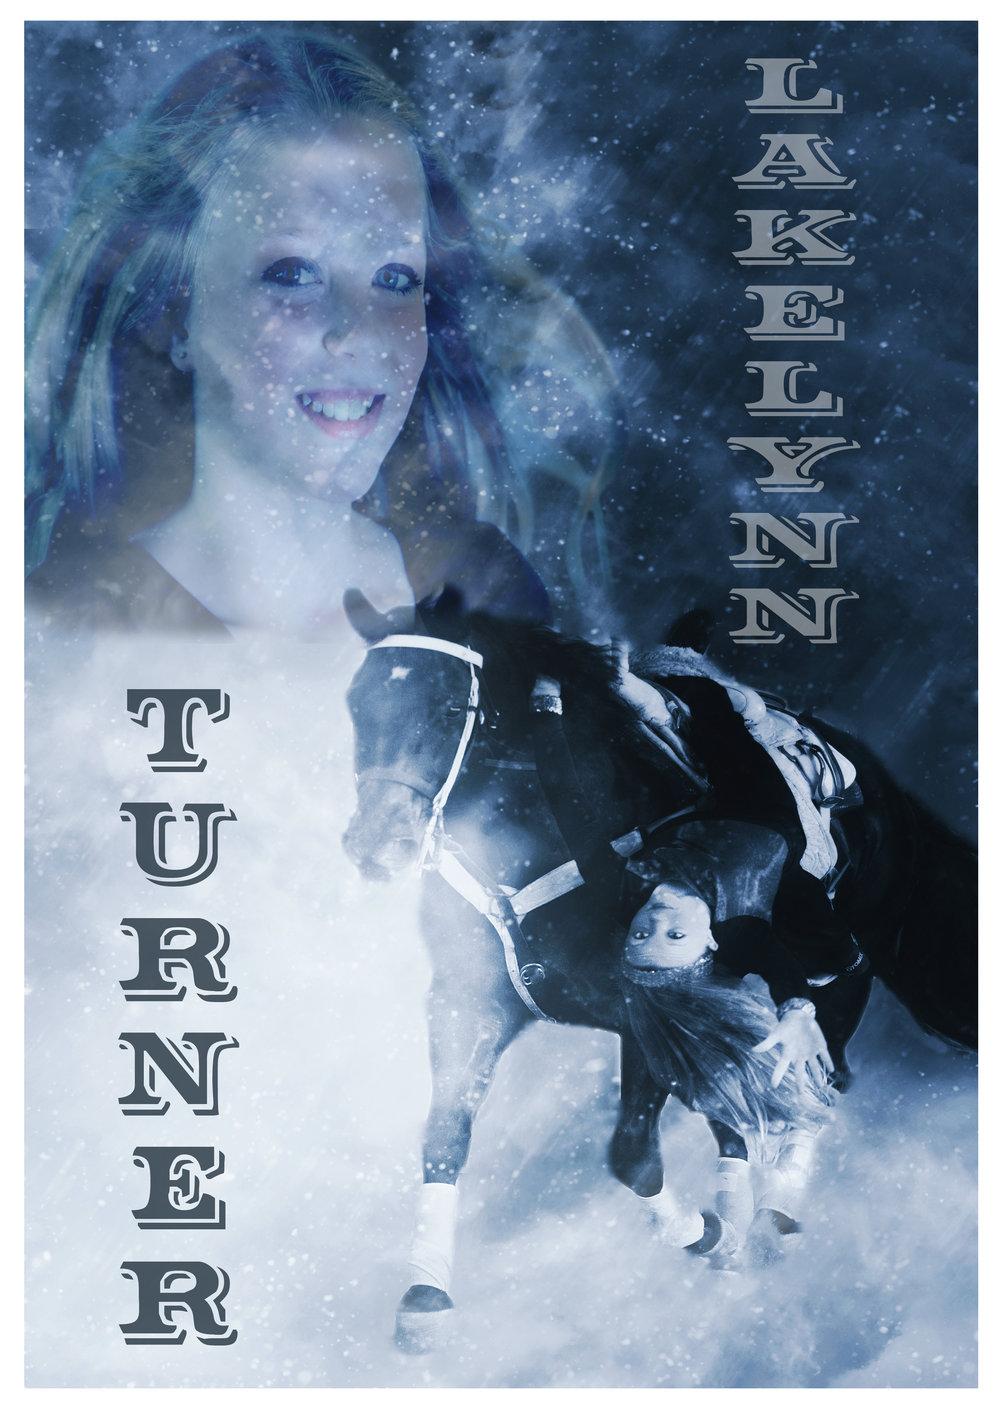 Lakelynn Poster 2.jpg